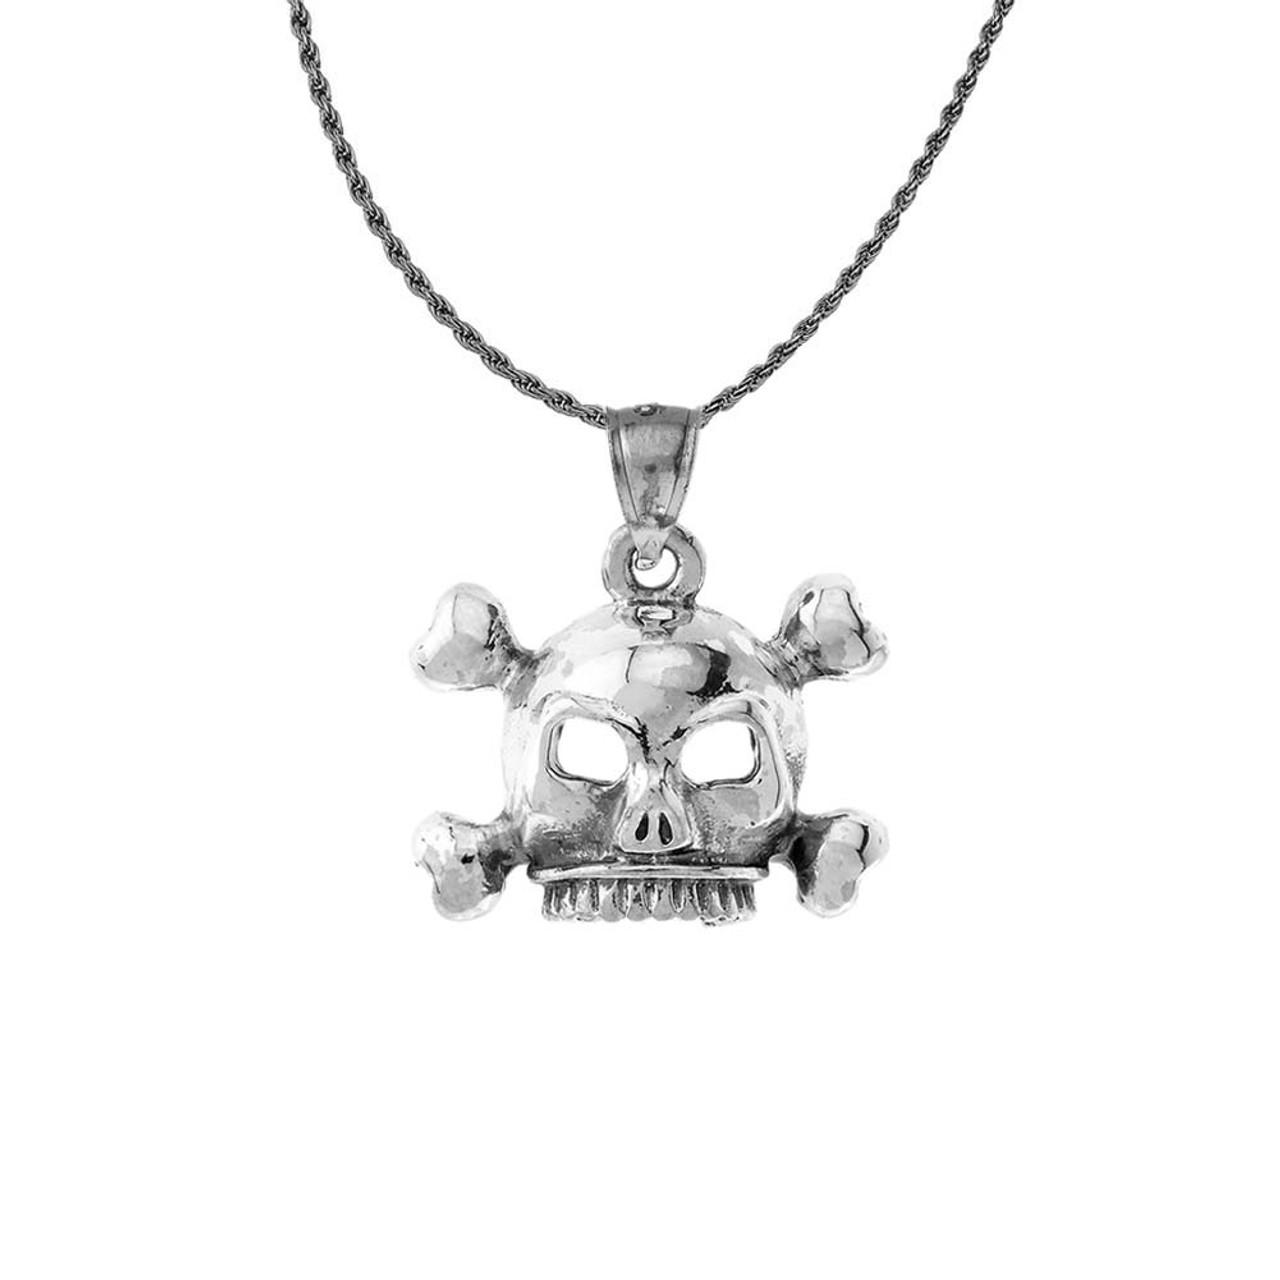 vintage style skull bones pendant necklace in sterling silver